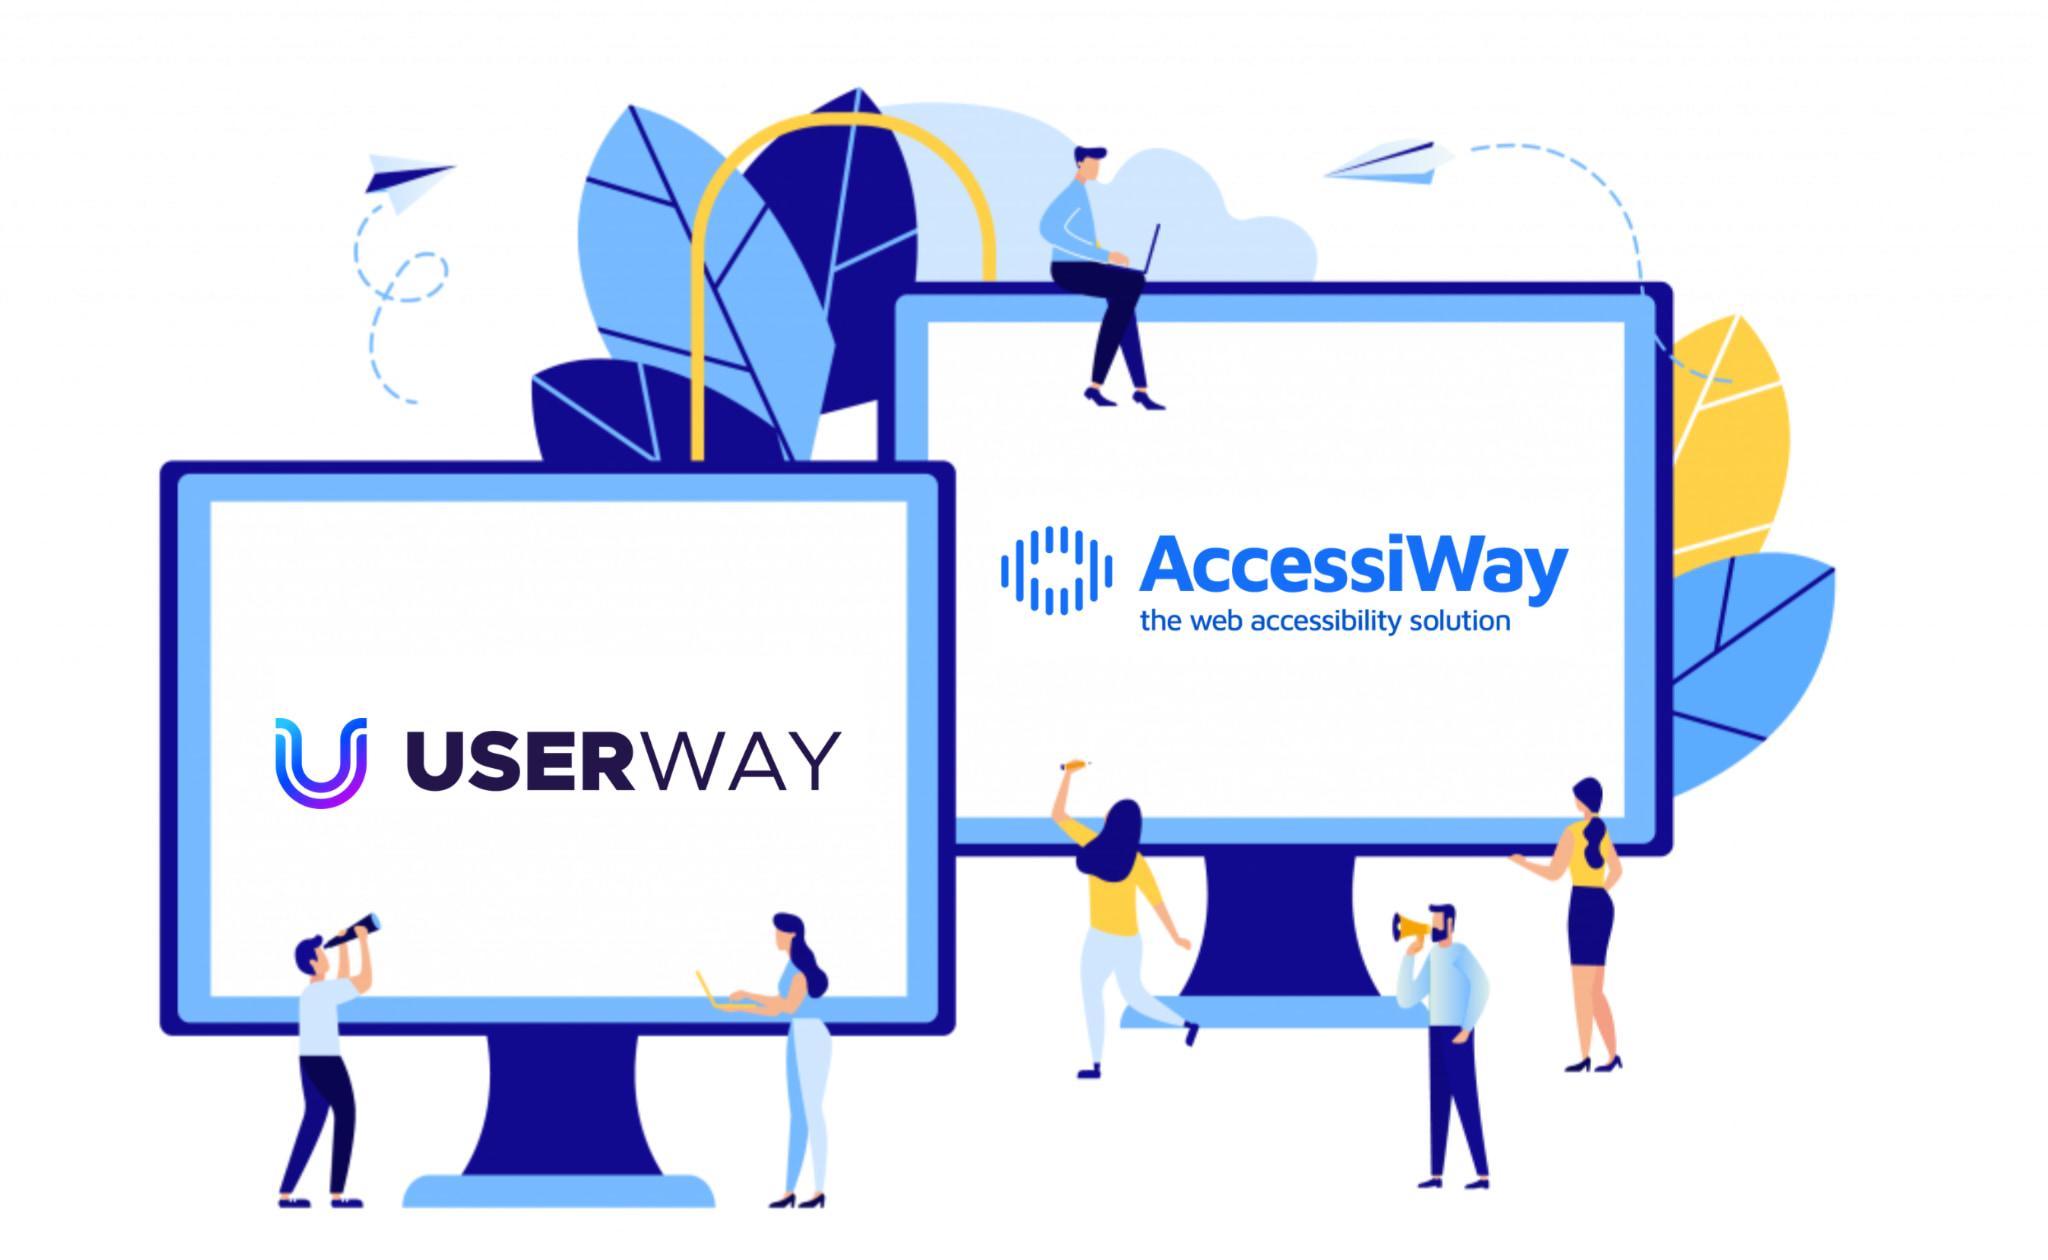 UserWay vs AccessiWay